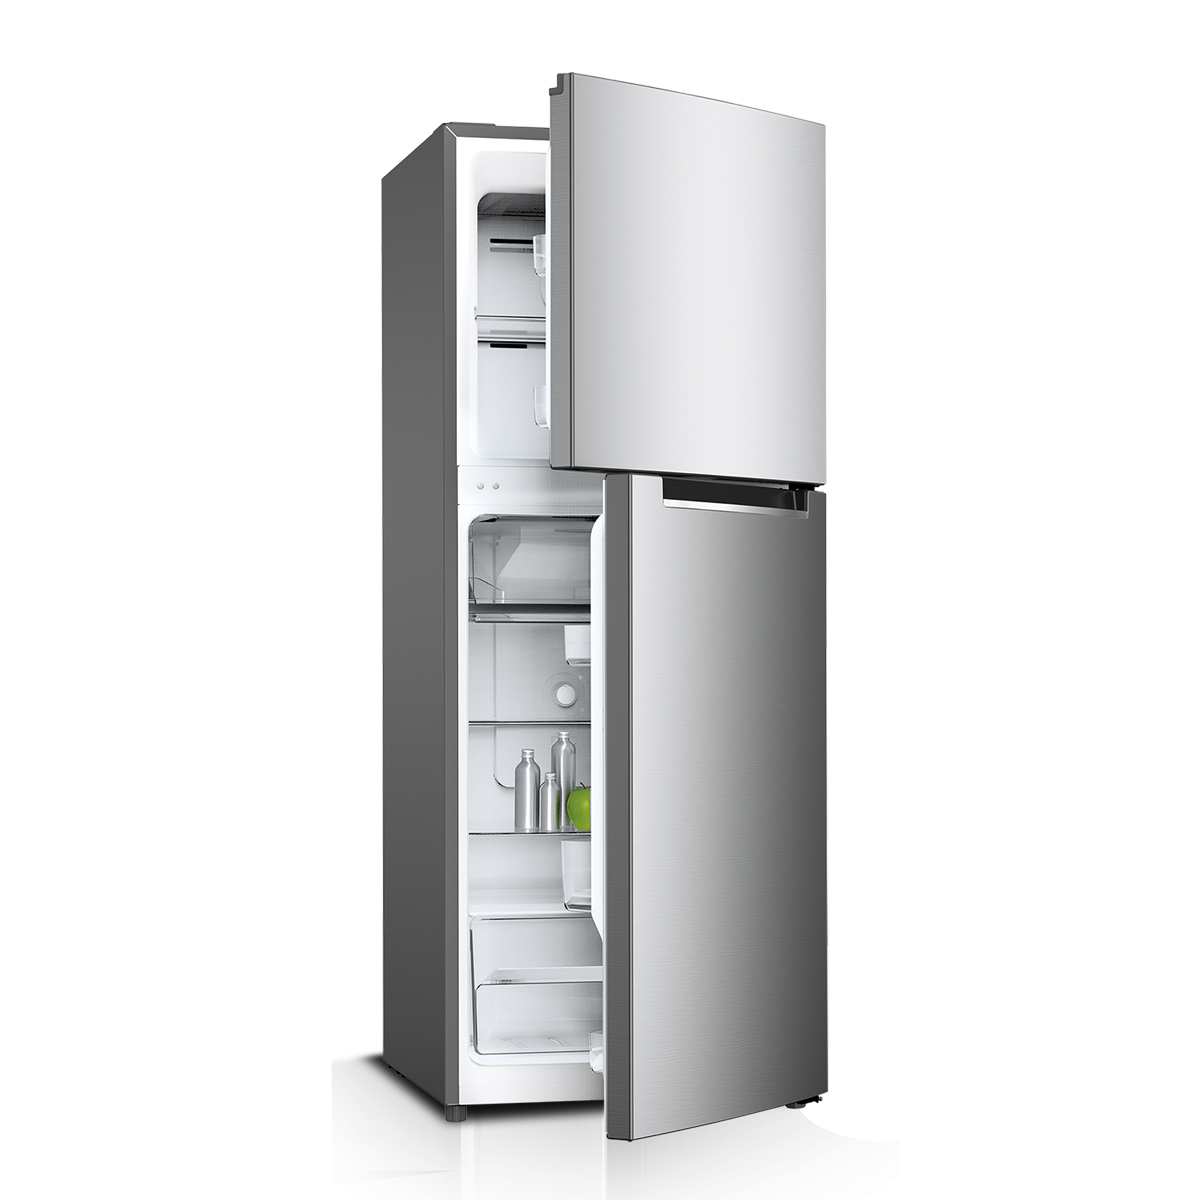 Haier 2 door fridge 240l hrf238h end 9 22 2018 11 49 am for 1 door fridge malaysia